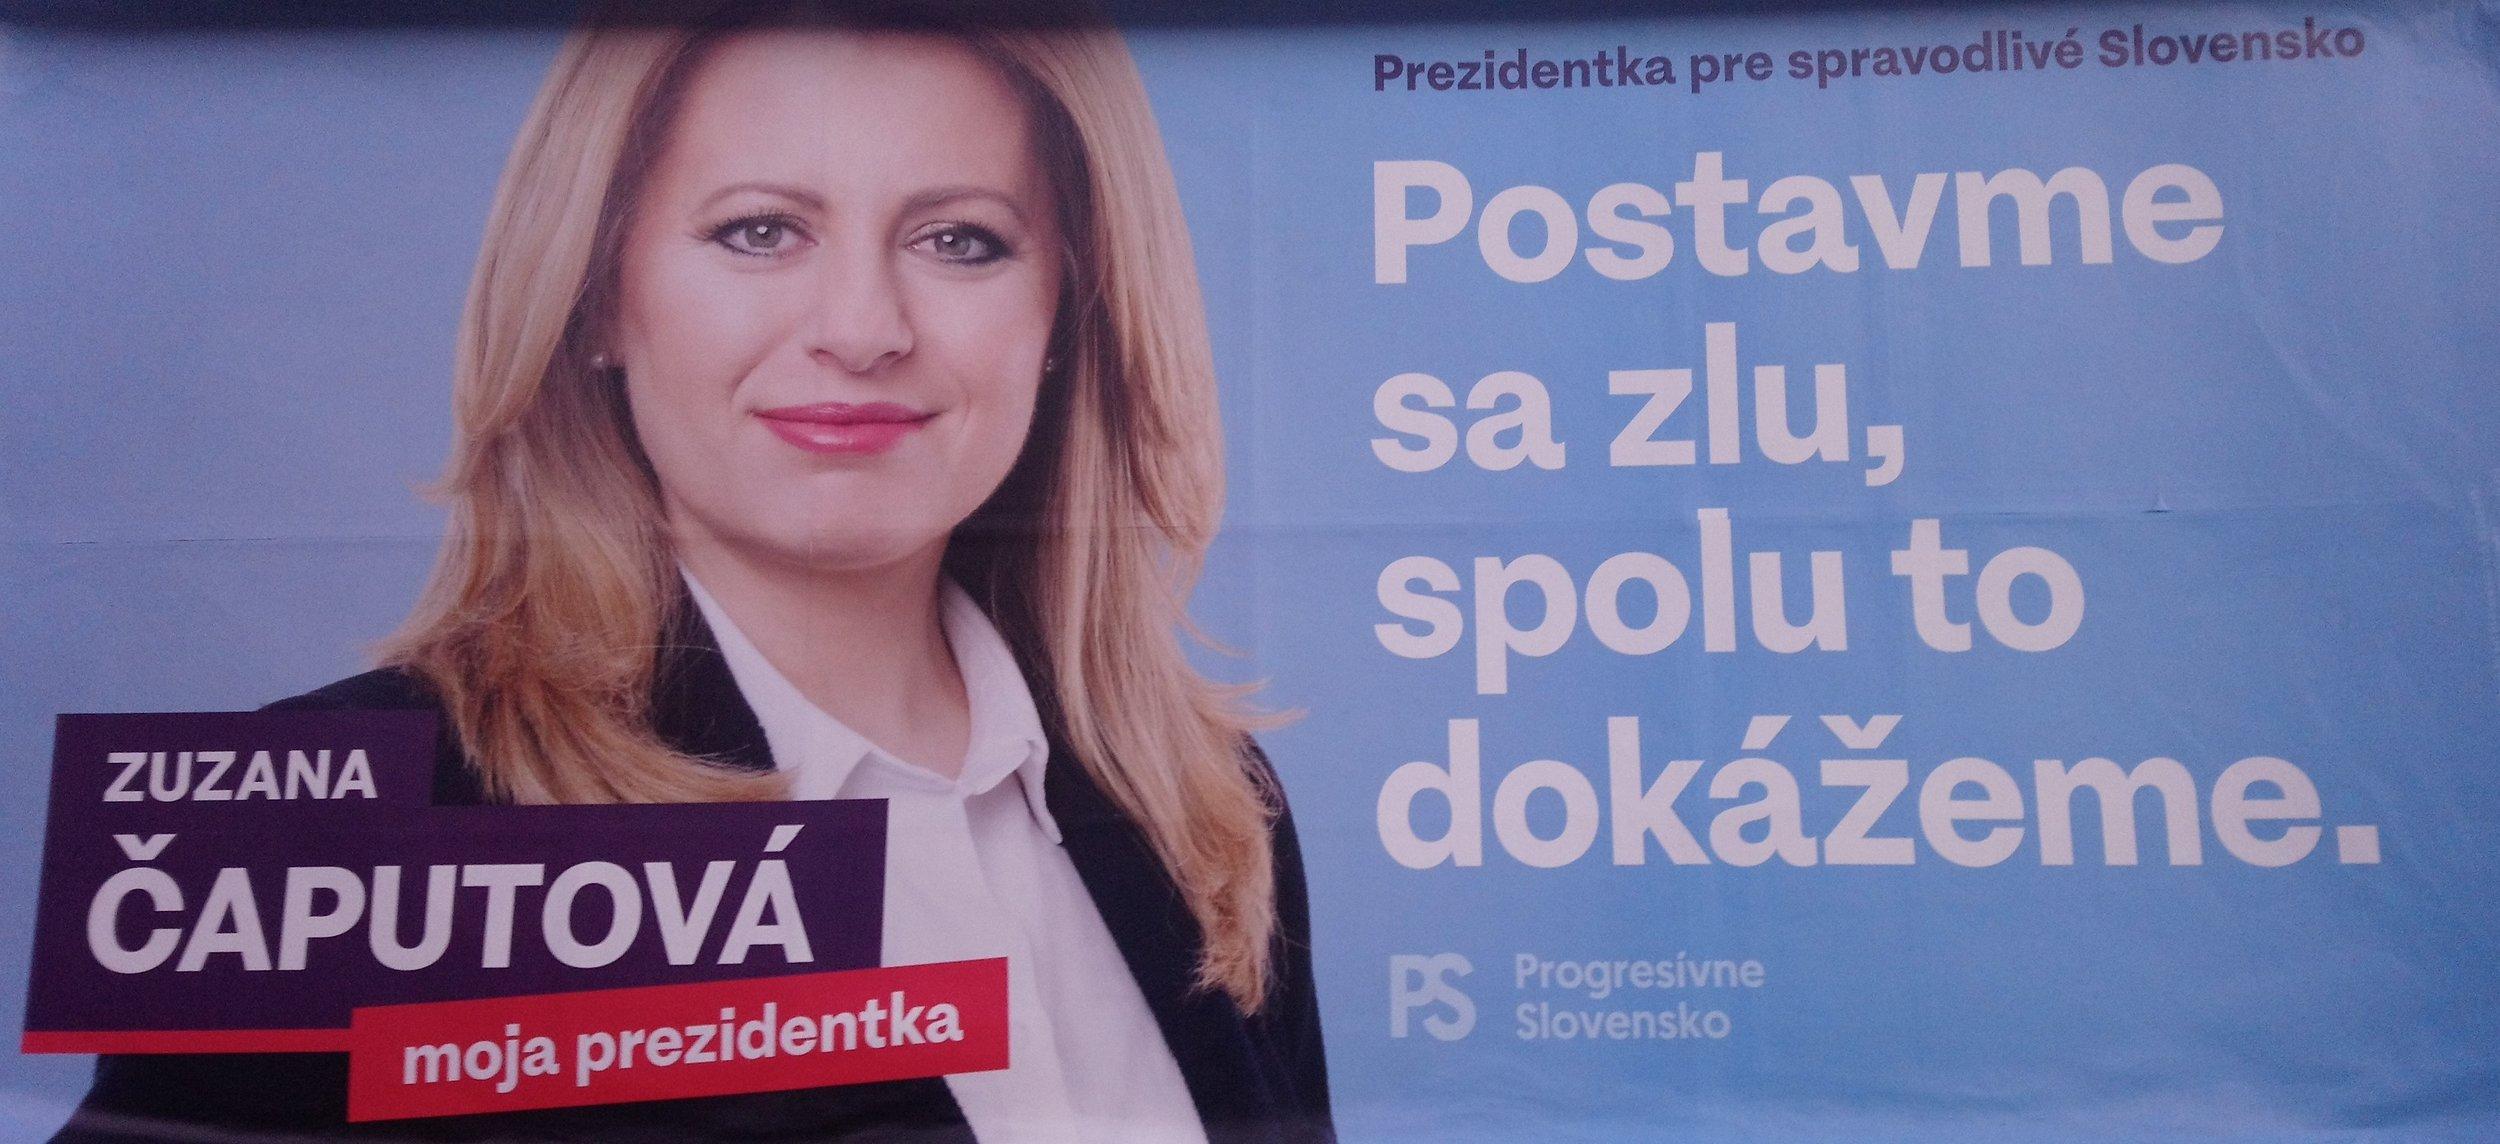 An election billboard for recently elected Slovak President Zuzana Caputova. (Wikimedia)